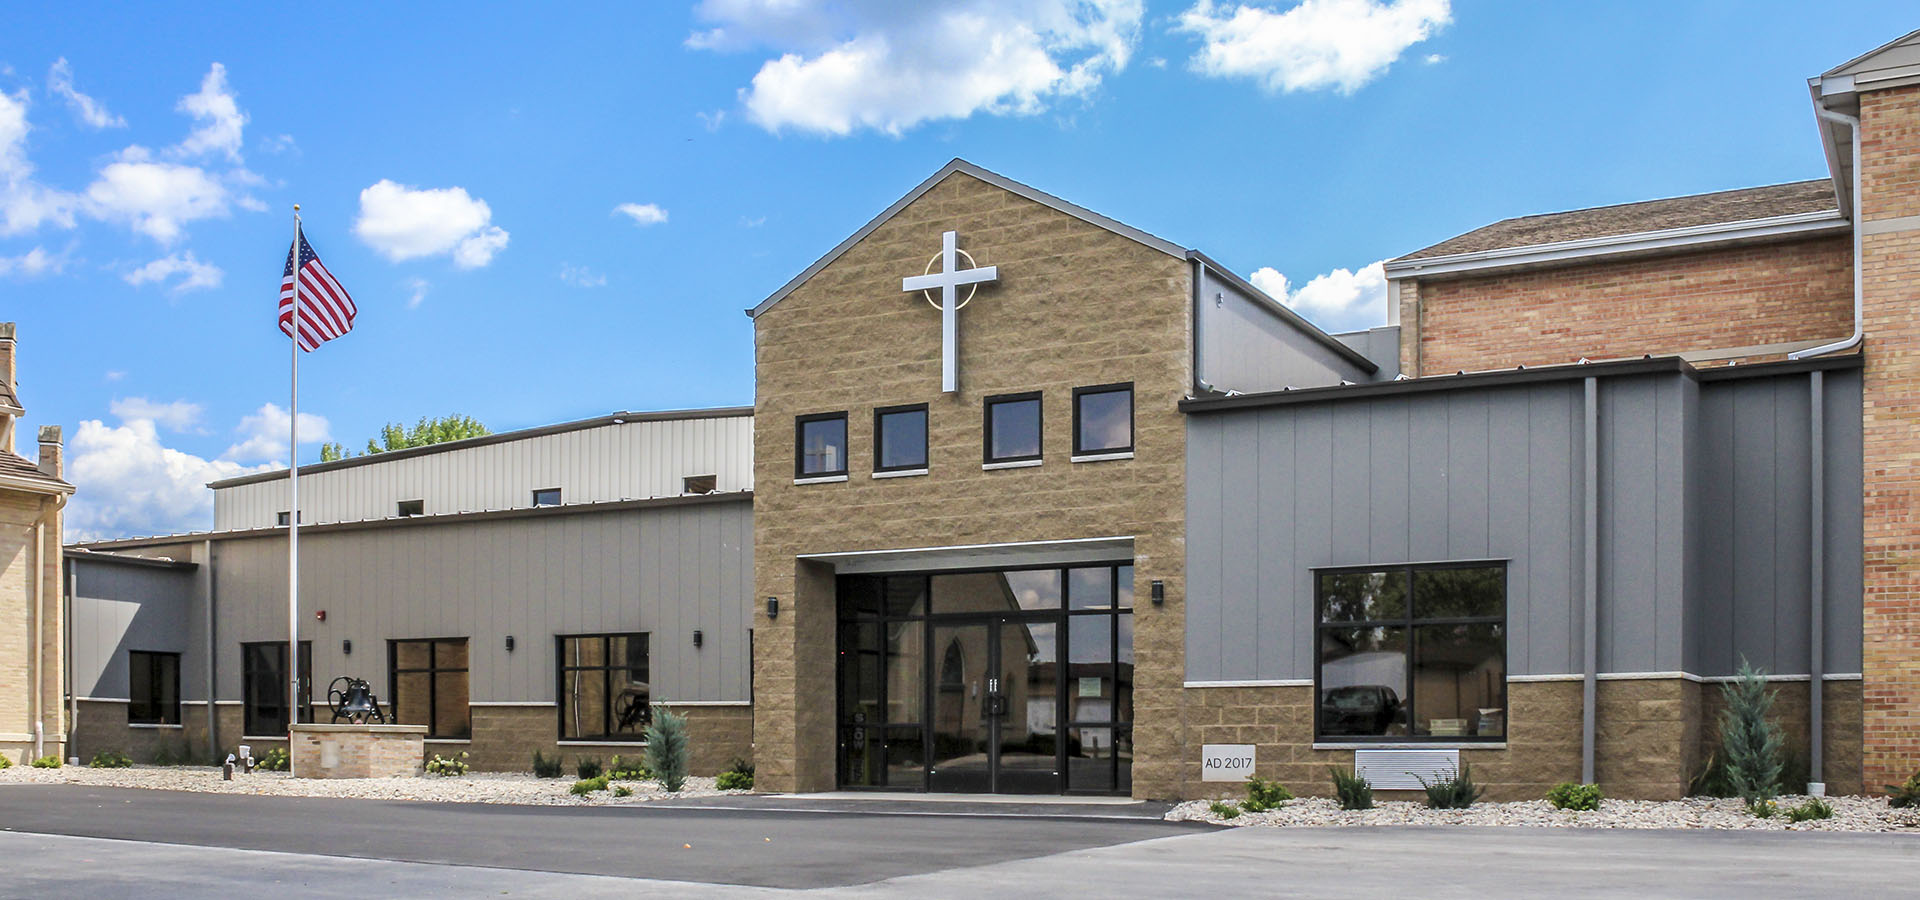 St John's-St James Addition   ACE Building Service